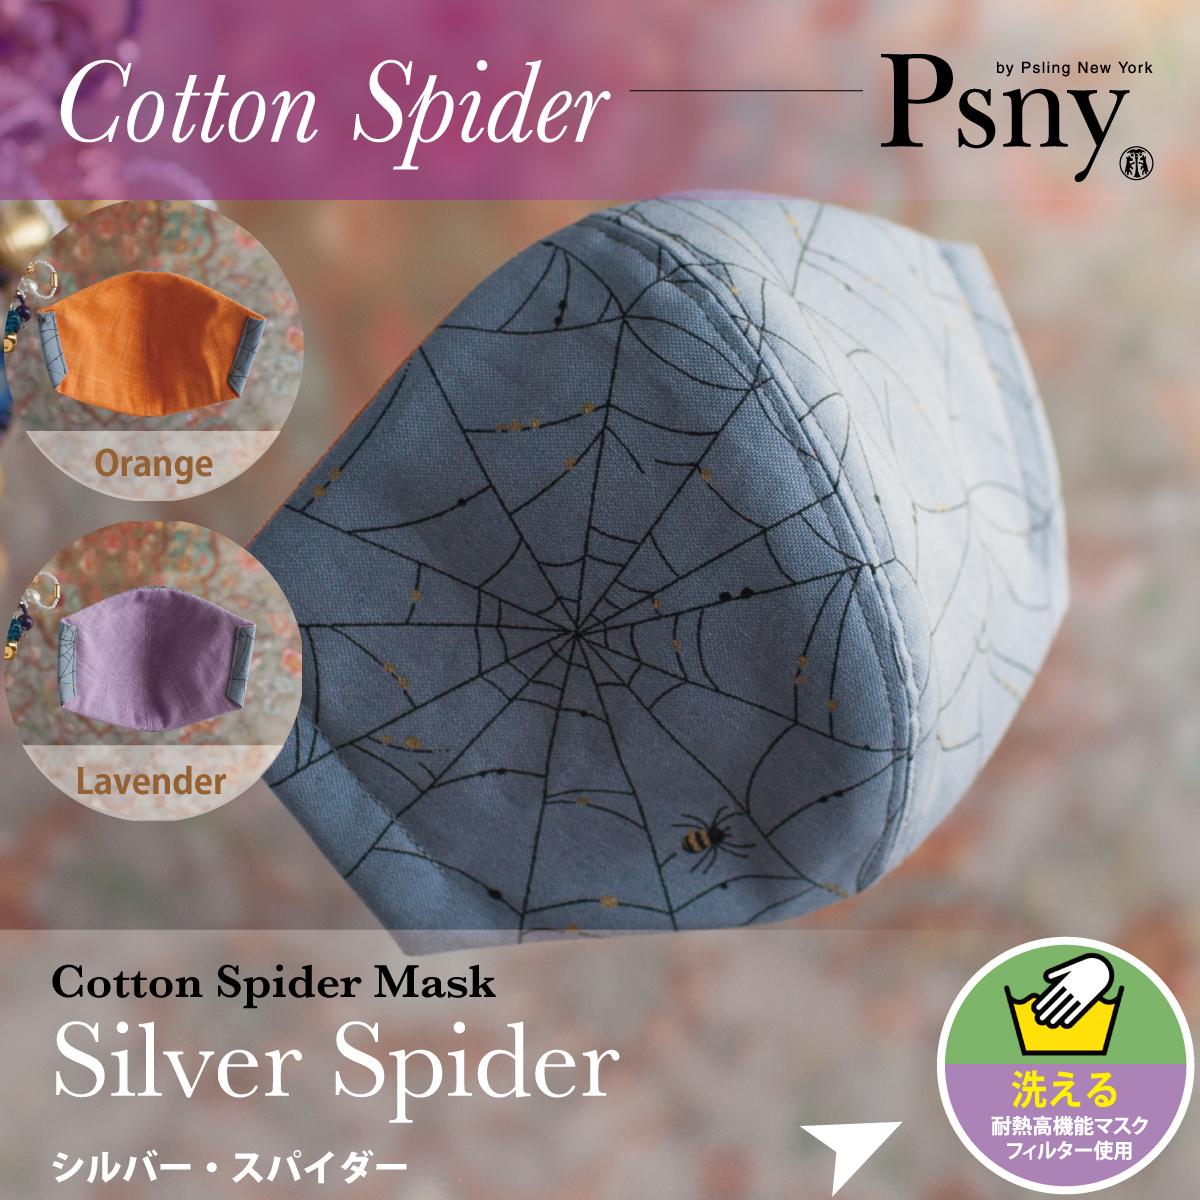 PSNY 送料無料 コットン スパイダー・シルバーブルー 蜘蛛 クモ カジュアル 個性的 カワイイ 可愛い ますく おとな 花粉 黄砂 洗える不織布フィルター入り 高級 立体 大人用 マスク CT01